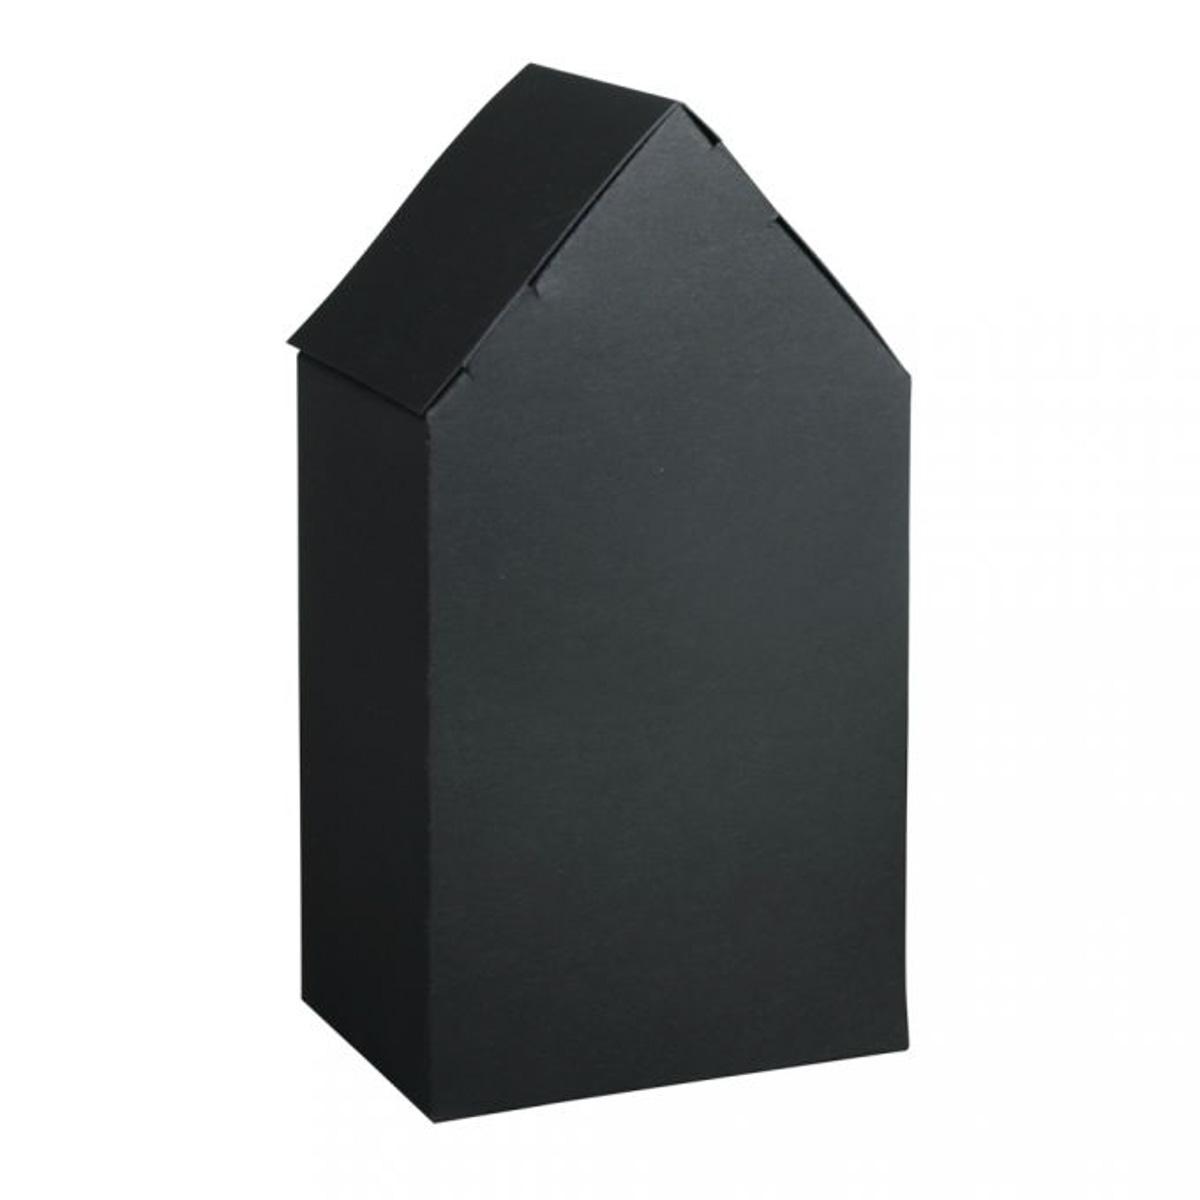 Rayher Geschenkboxen Faltschachteln Haus 3 Stück schwarz 10x7,5x20cm